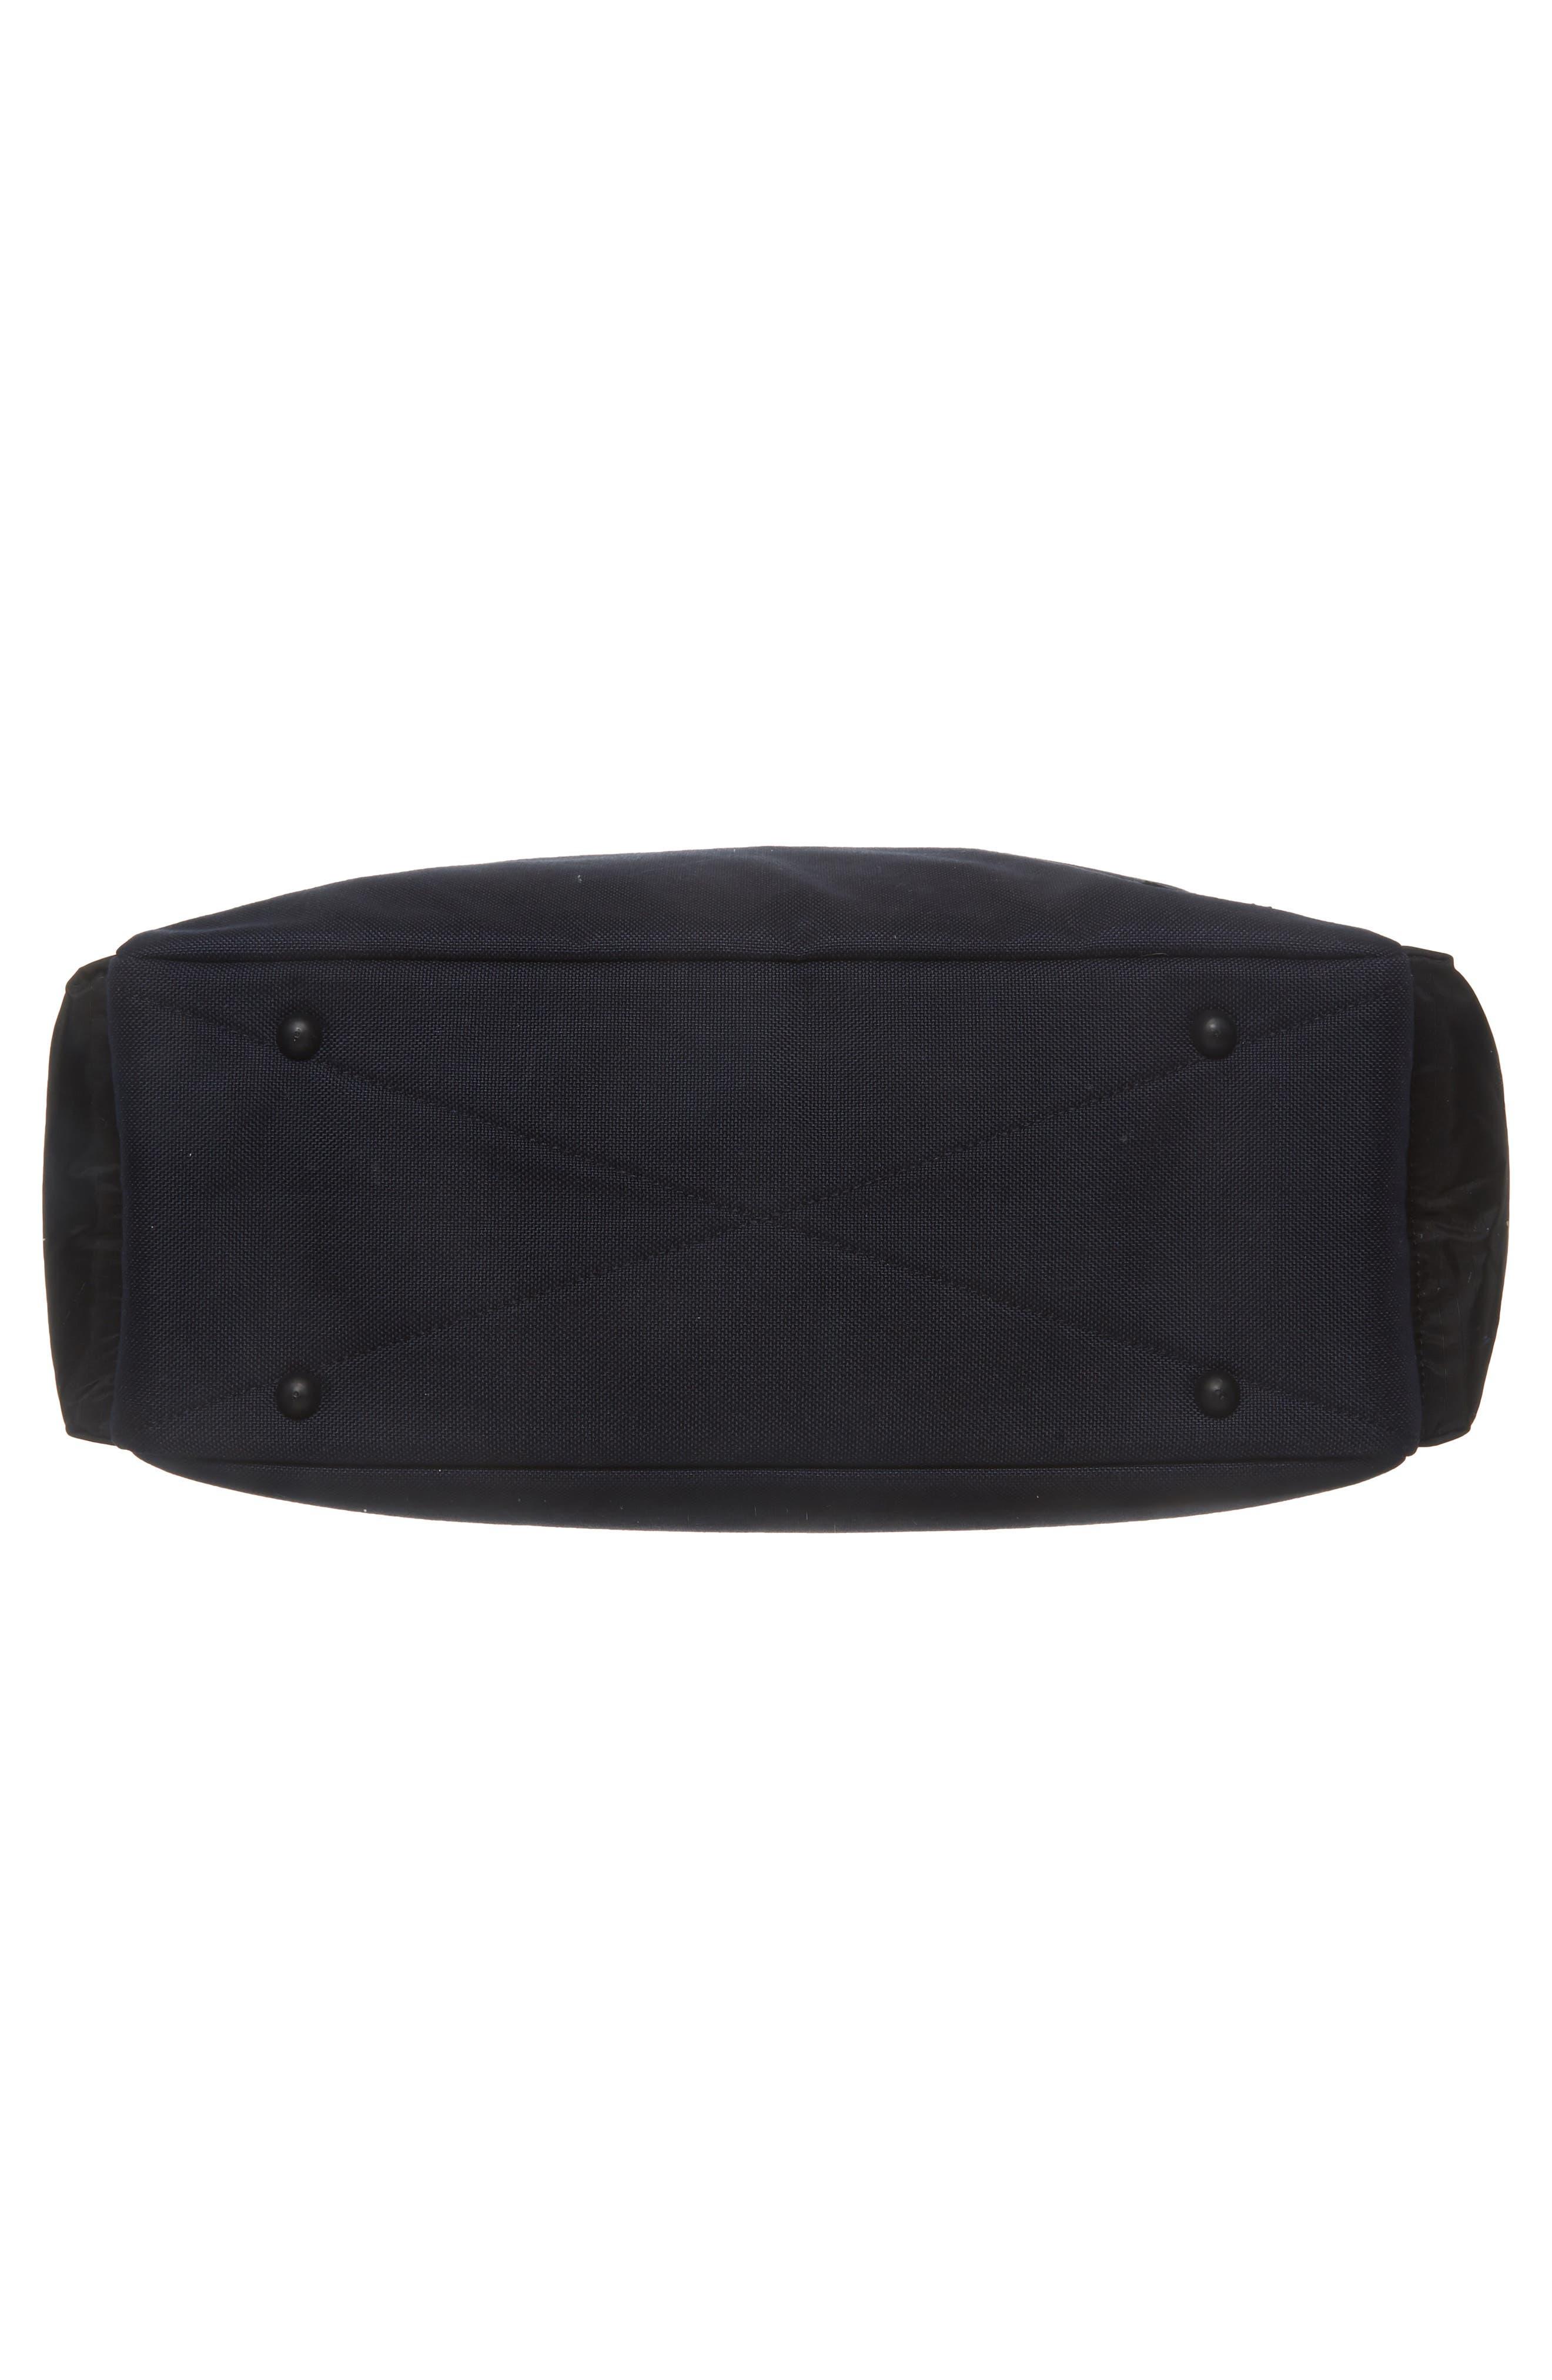 Porter-Yoshida & Co. Hype Tote Bag,                             Alternate thumbnail 6, color,                             Navy/ Black